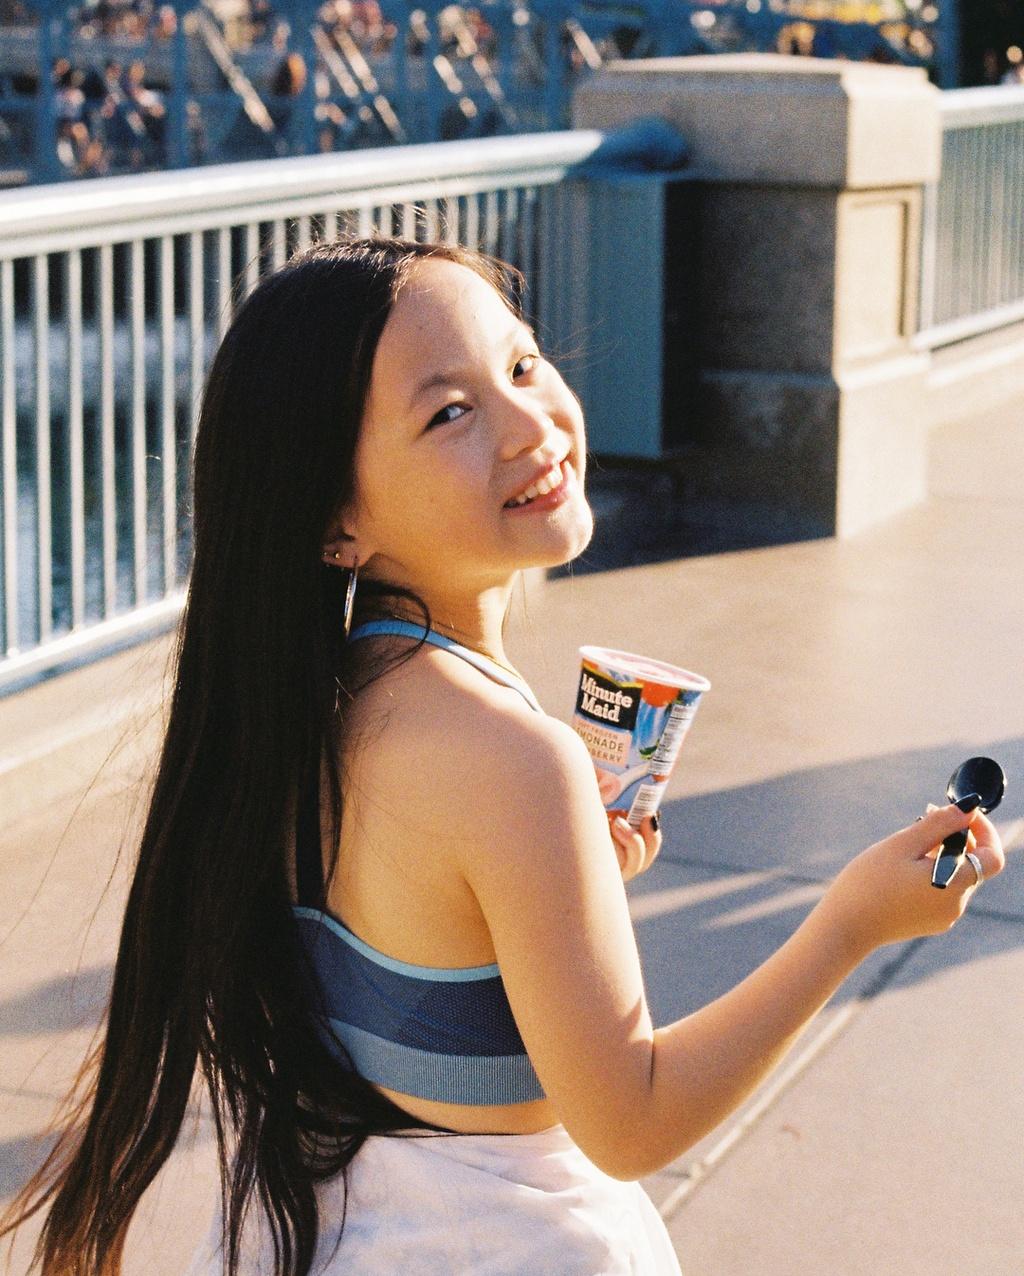 Tai nang nhay hip hop Amy Zhu anh 3